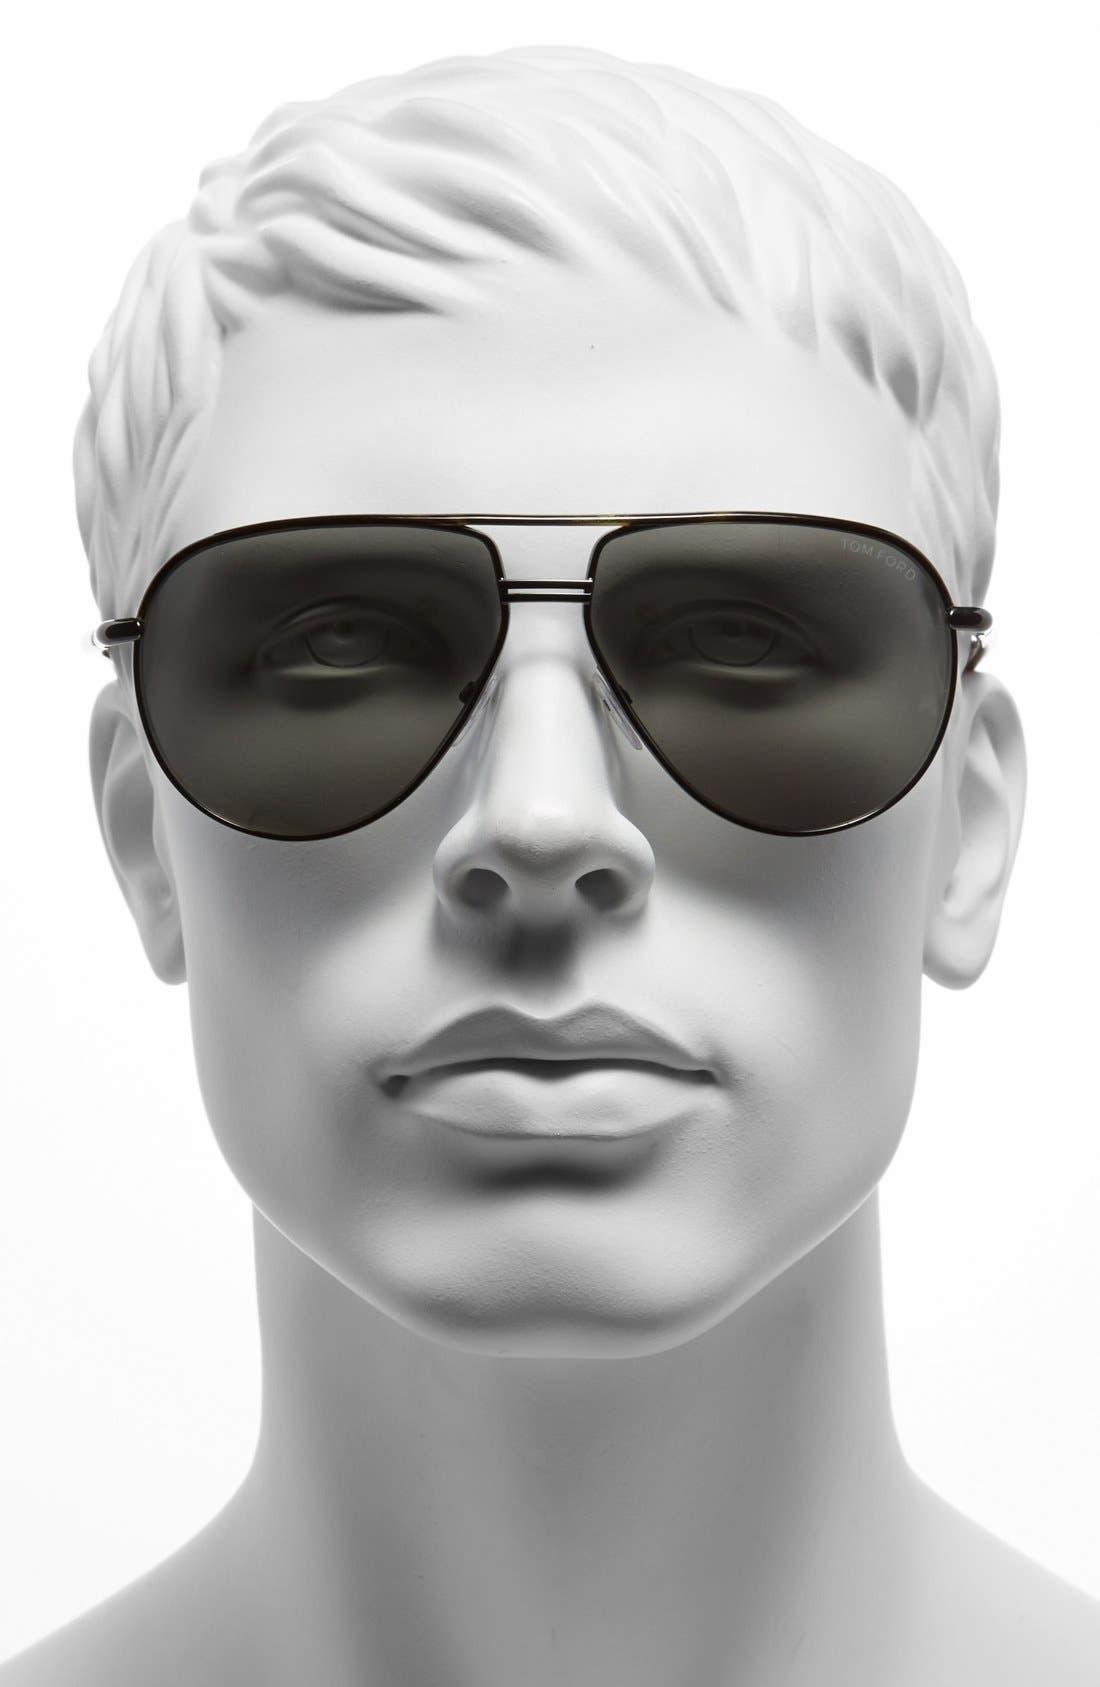 Cole 61mm Sunglasses,                             Alternate thumbnail 2, color,                             GUNMETAL/ DARK HAVANNA